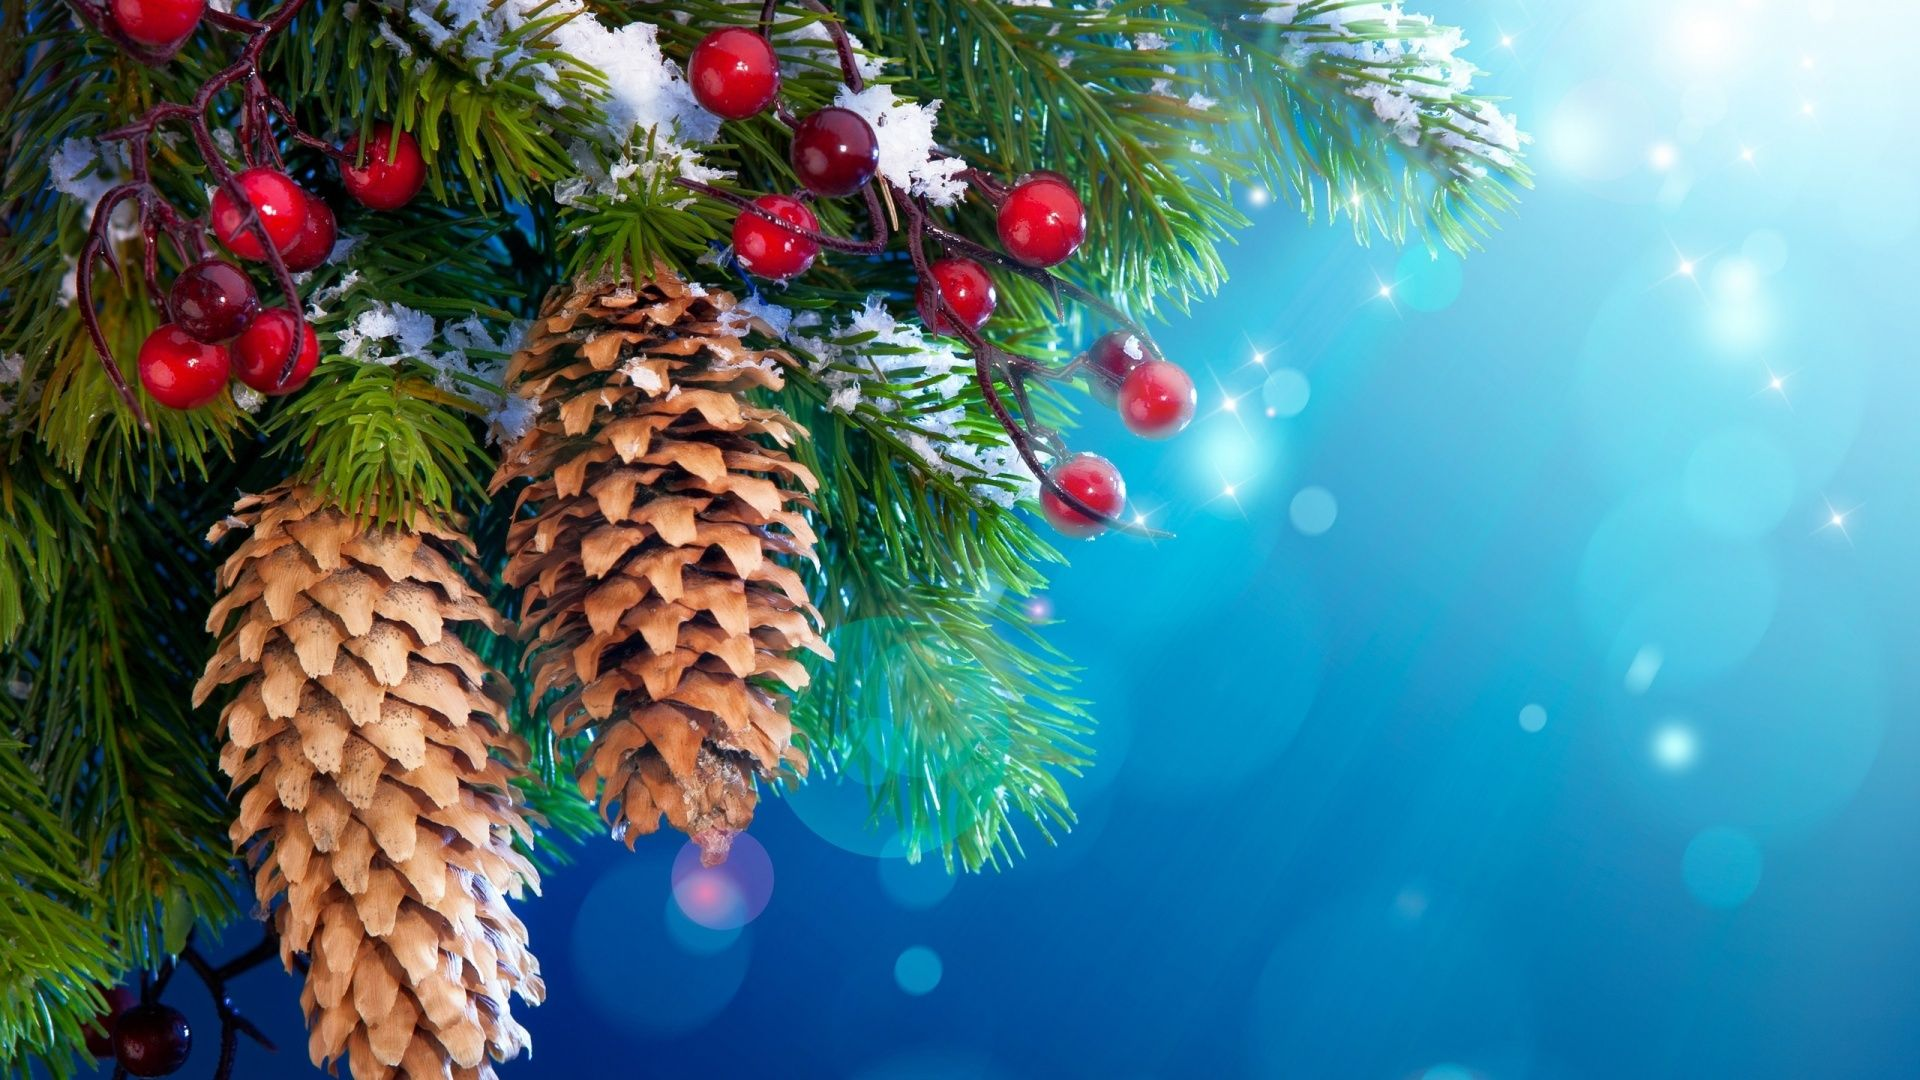 Christmas Tree beautiful wallpaper